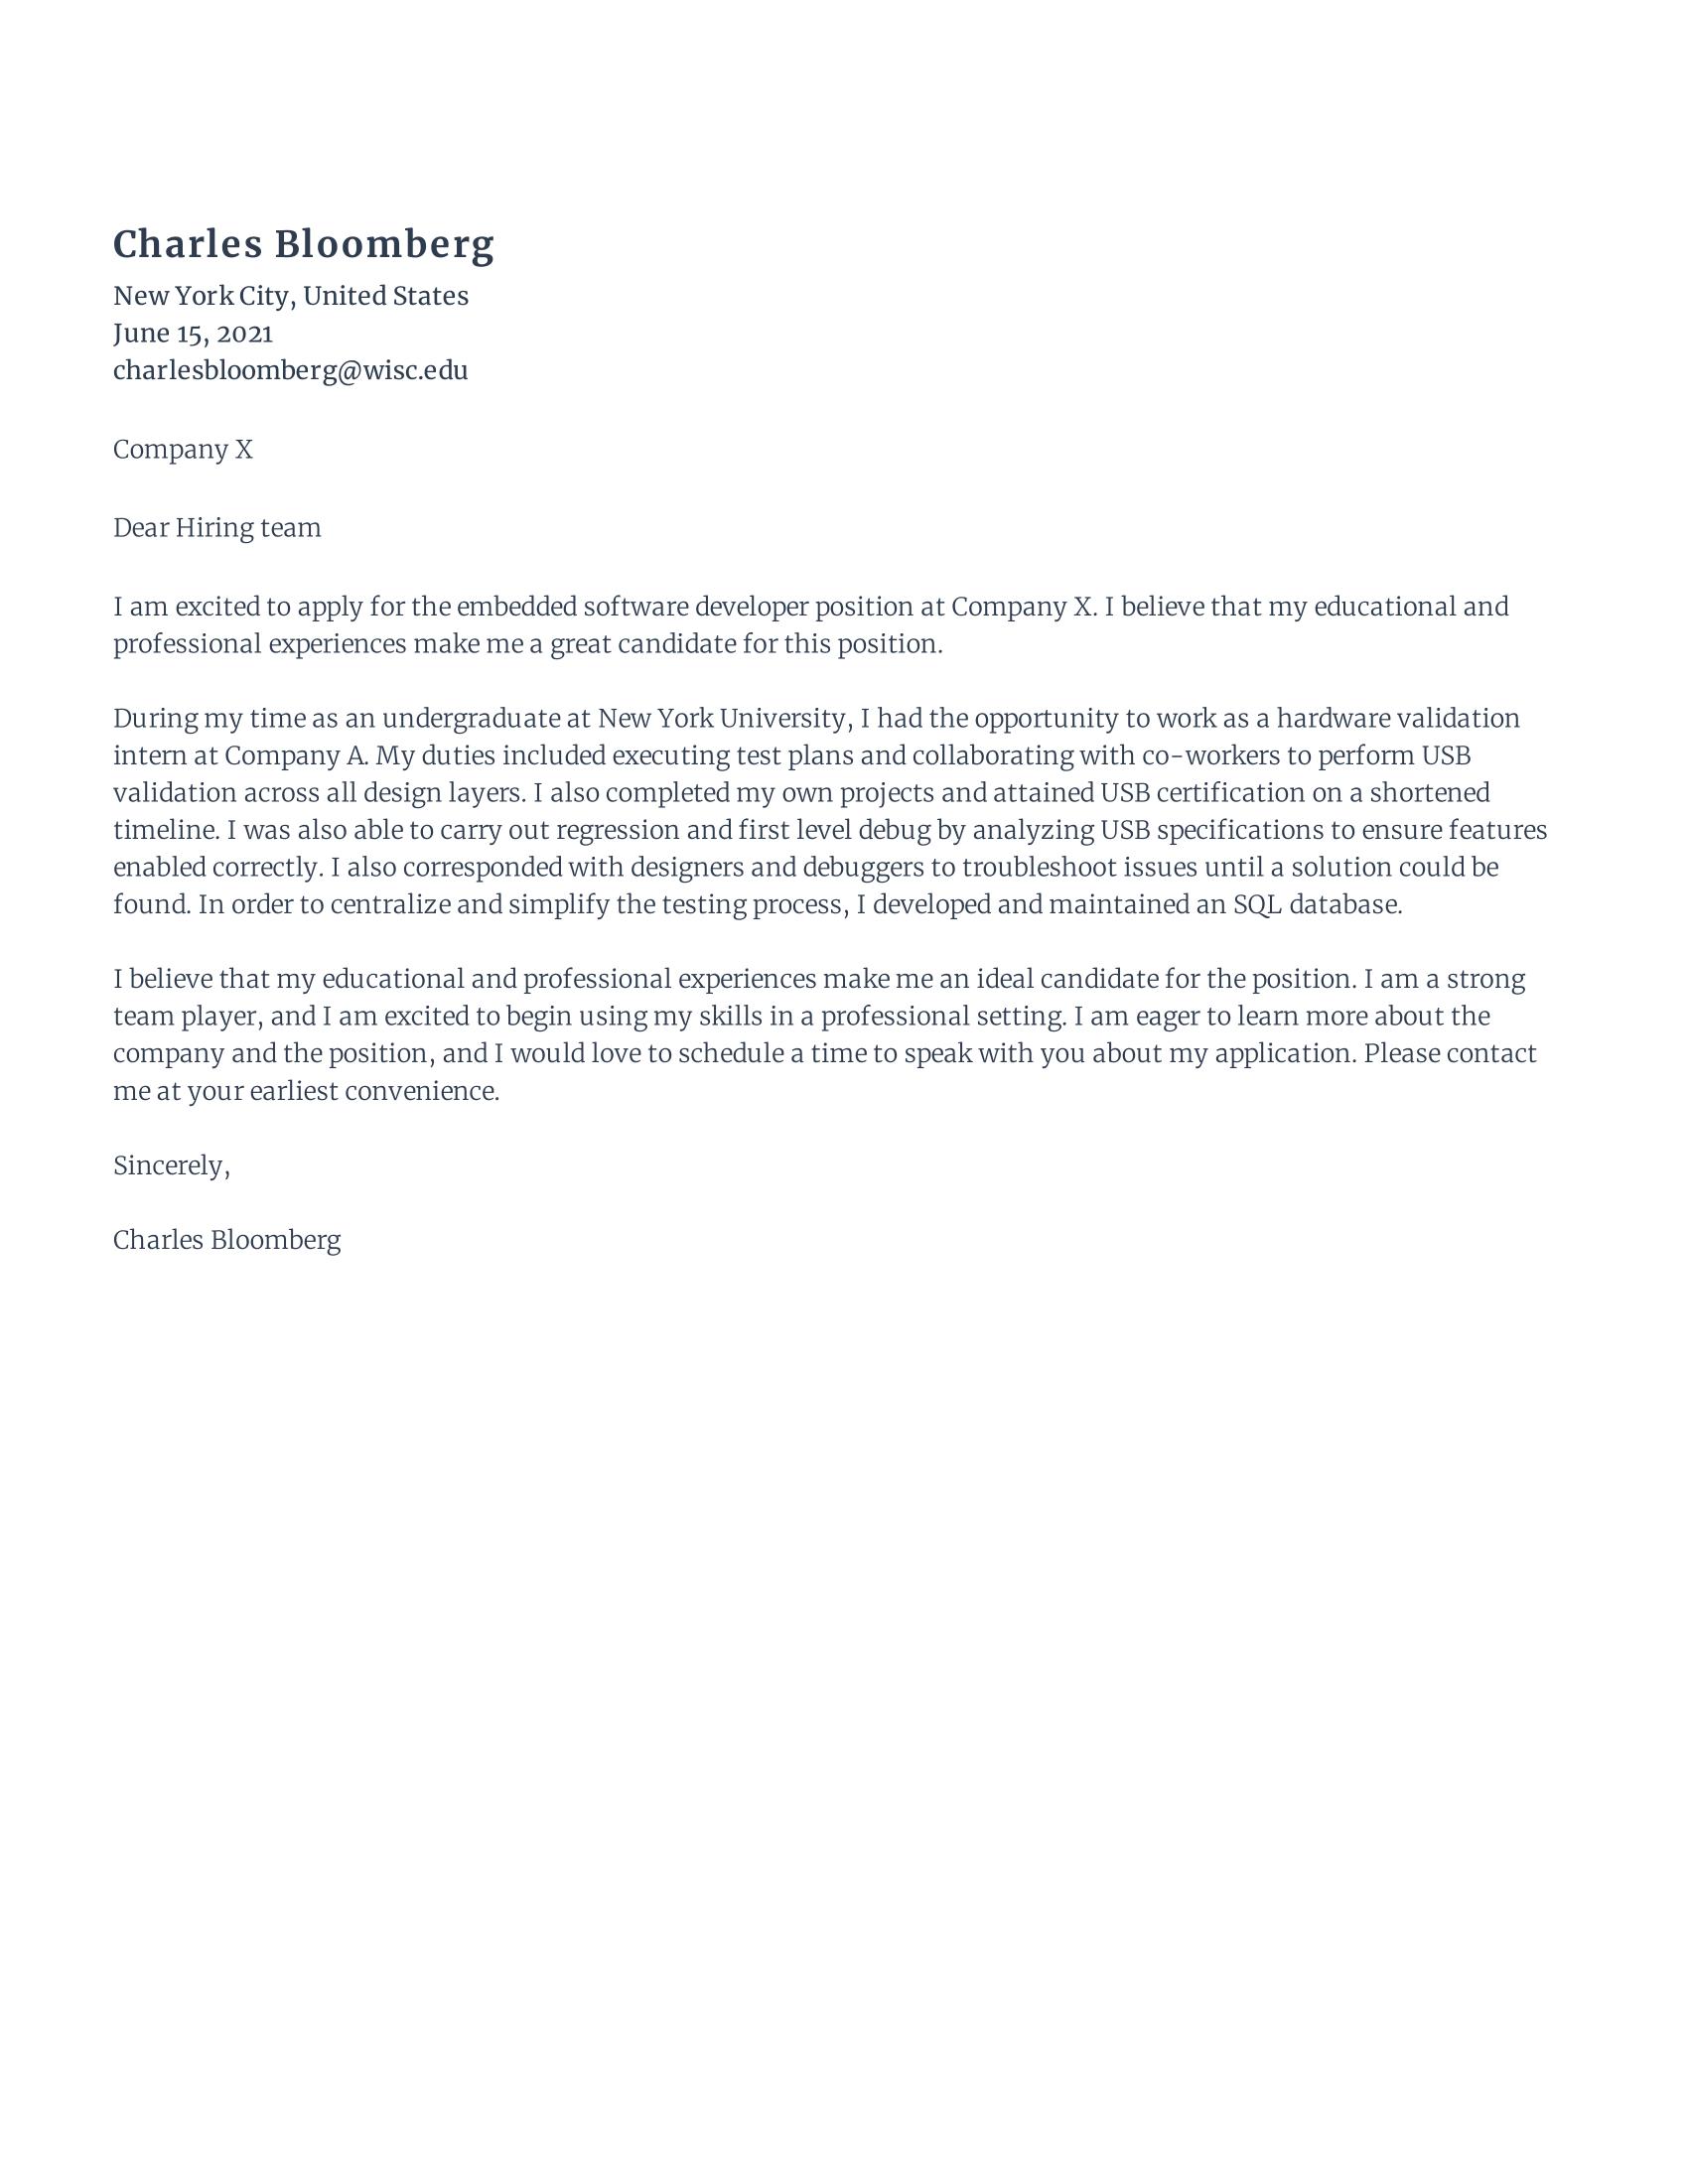 Embedded Software Developer Cover Letter